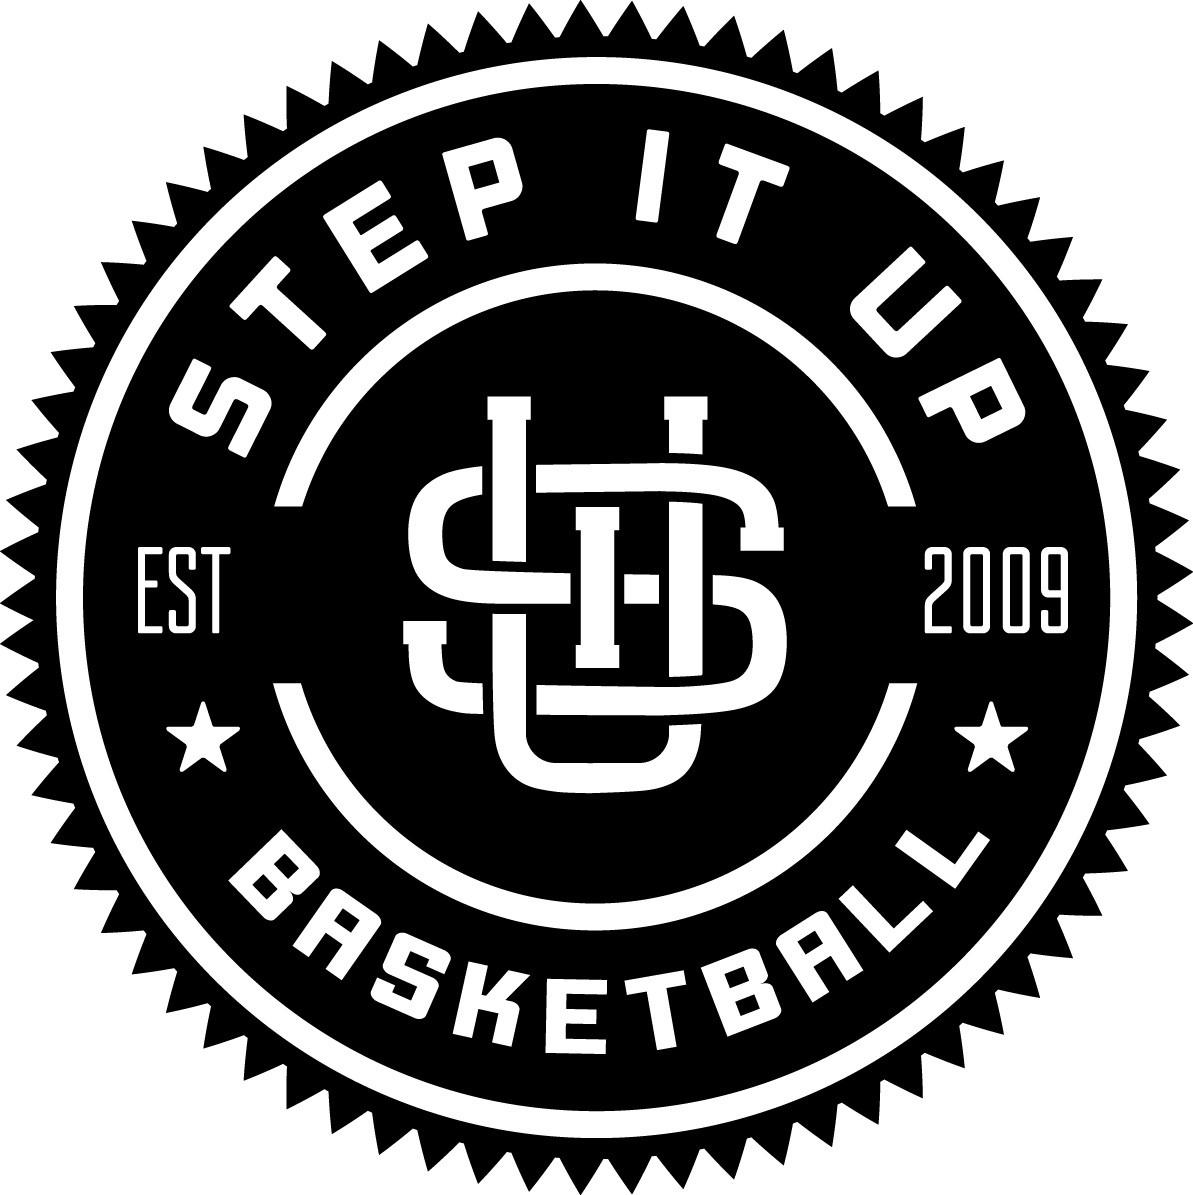 StepitUp_logo_version1_high (1).jpg